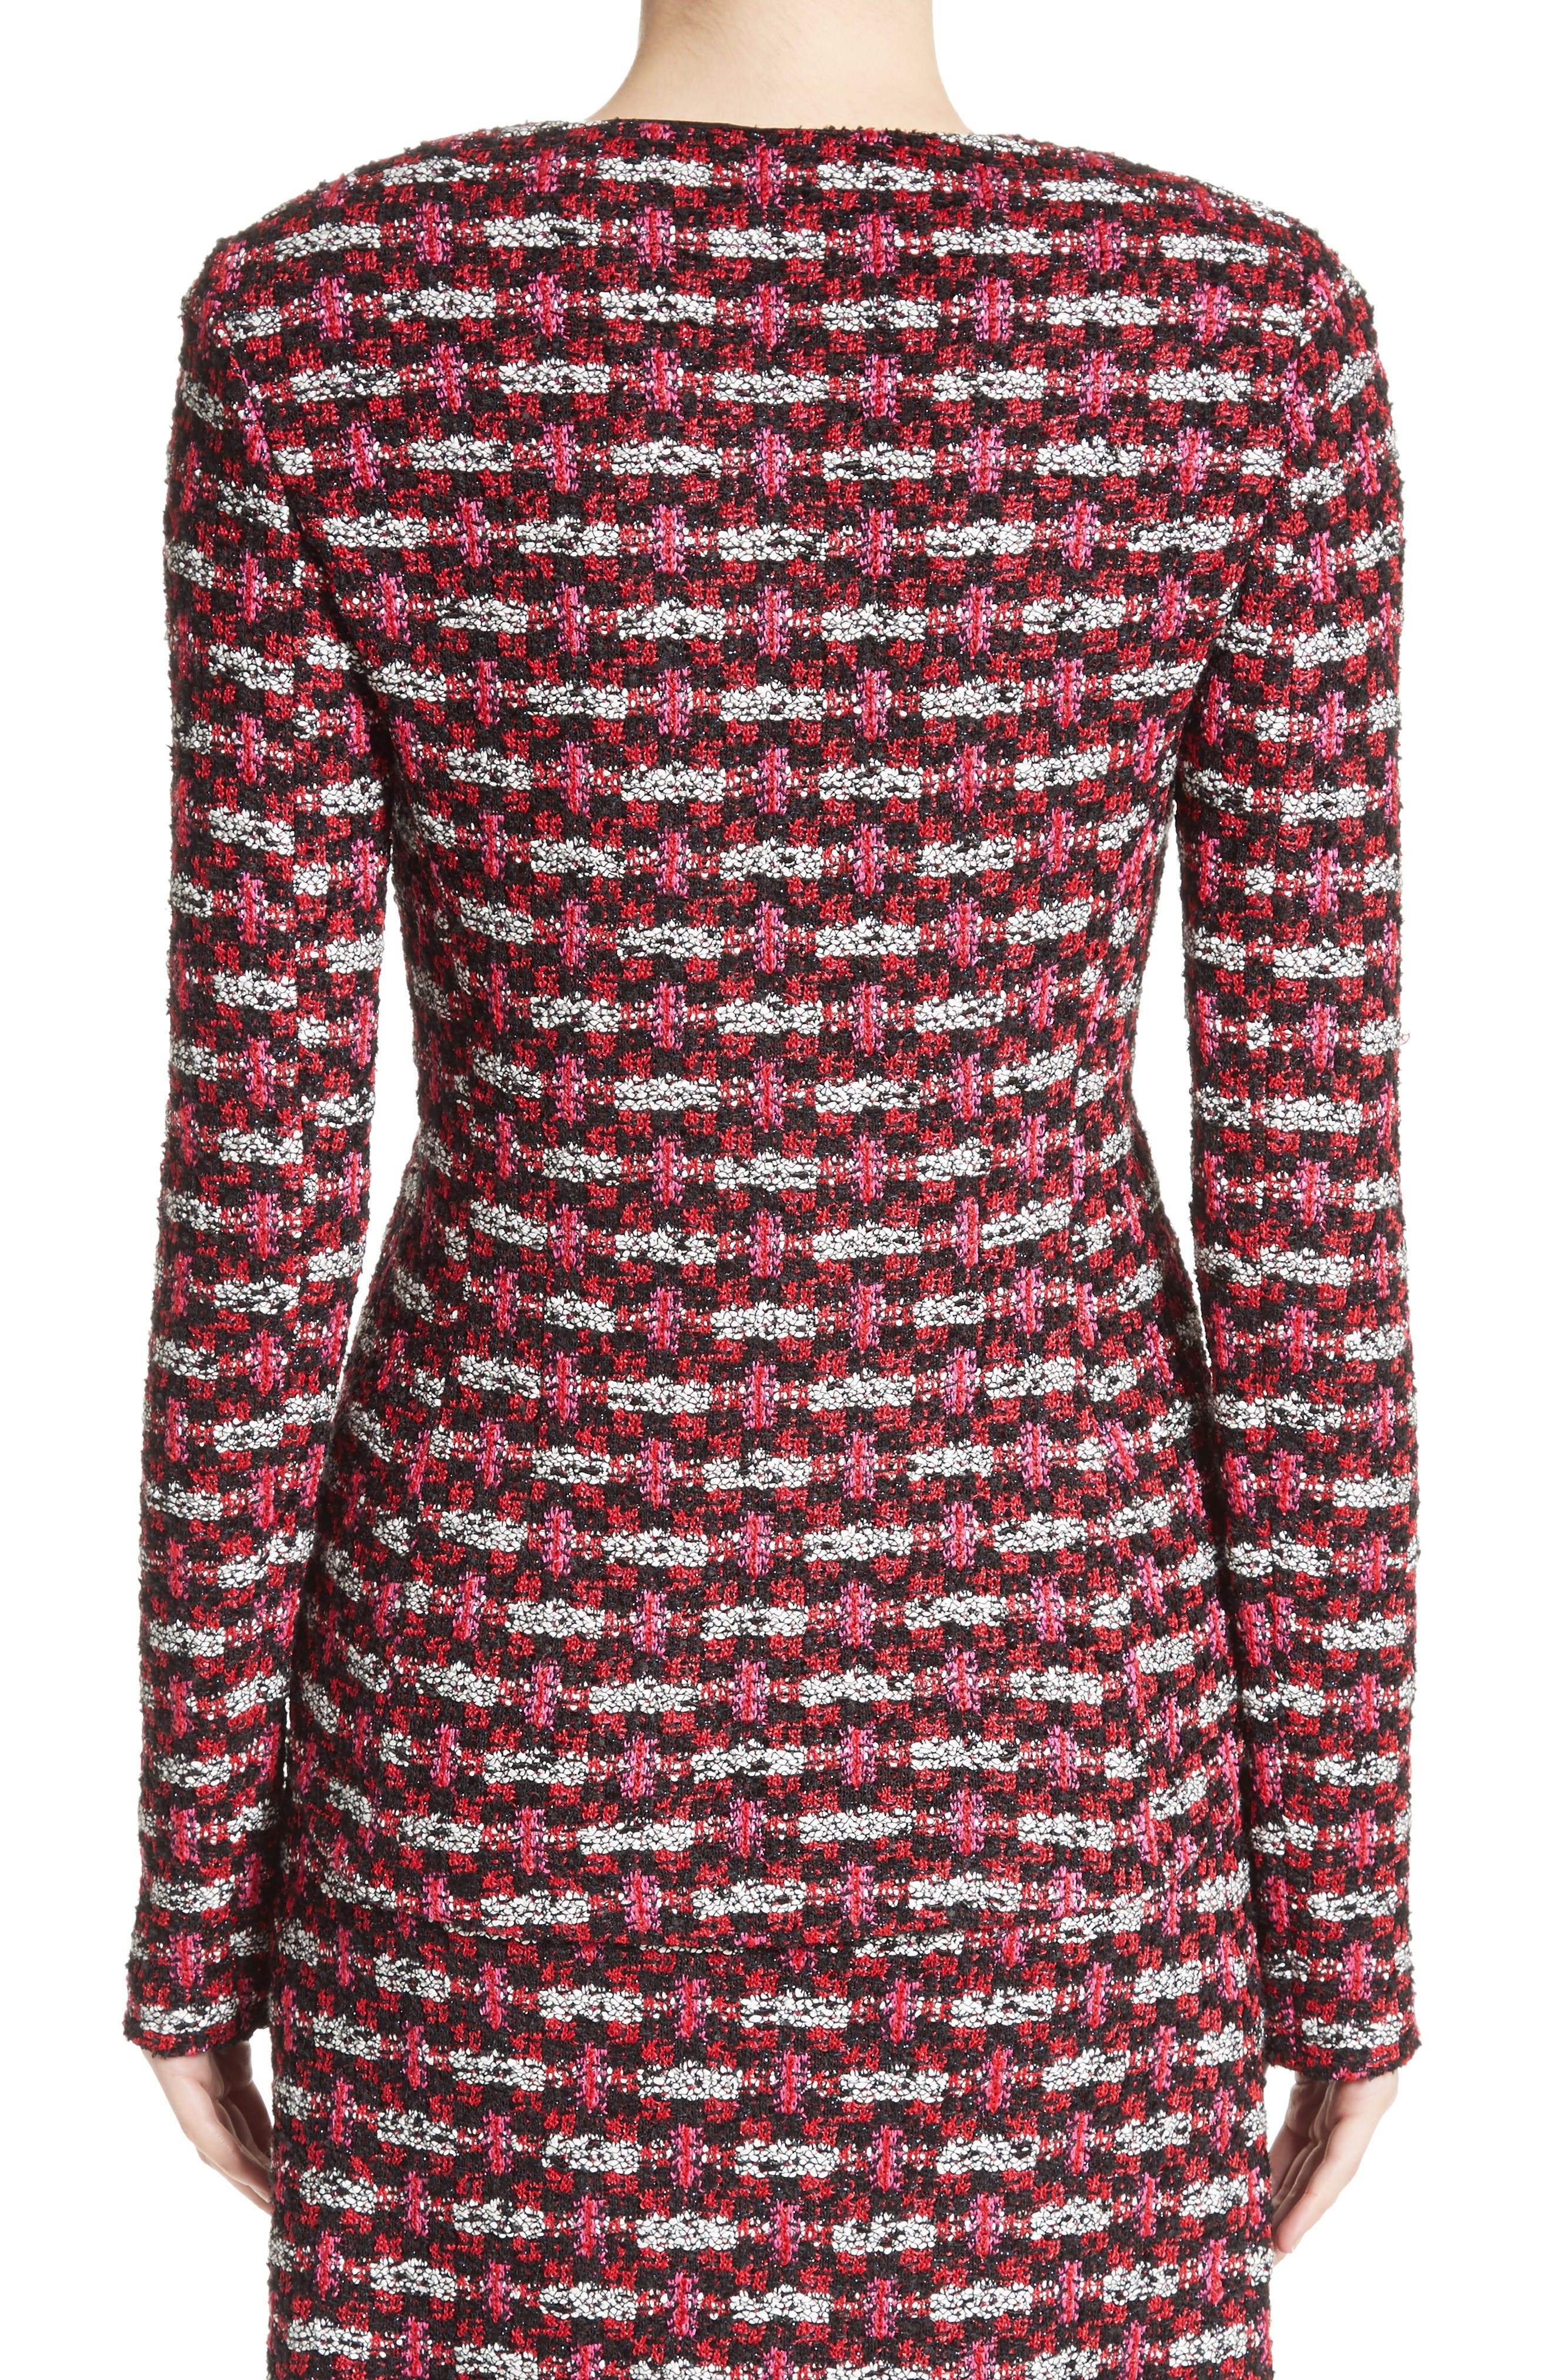 Hiran Tweed Knit Jacket,                             Alternate thumbnail 2, color,                             Scarlet Multi